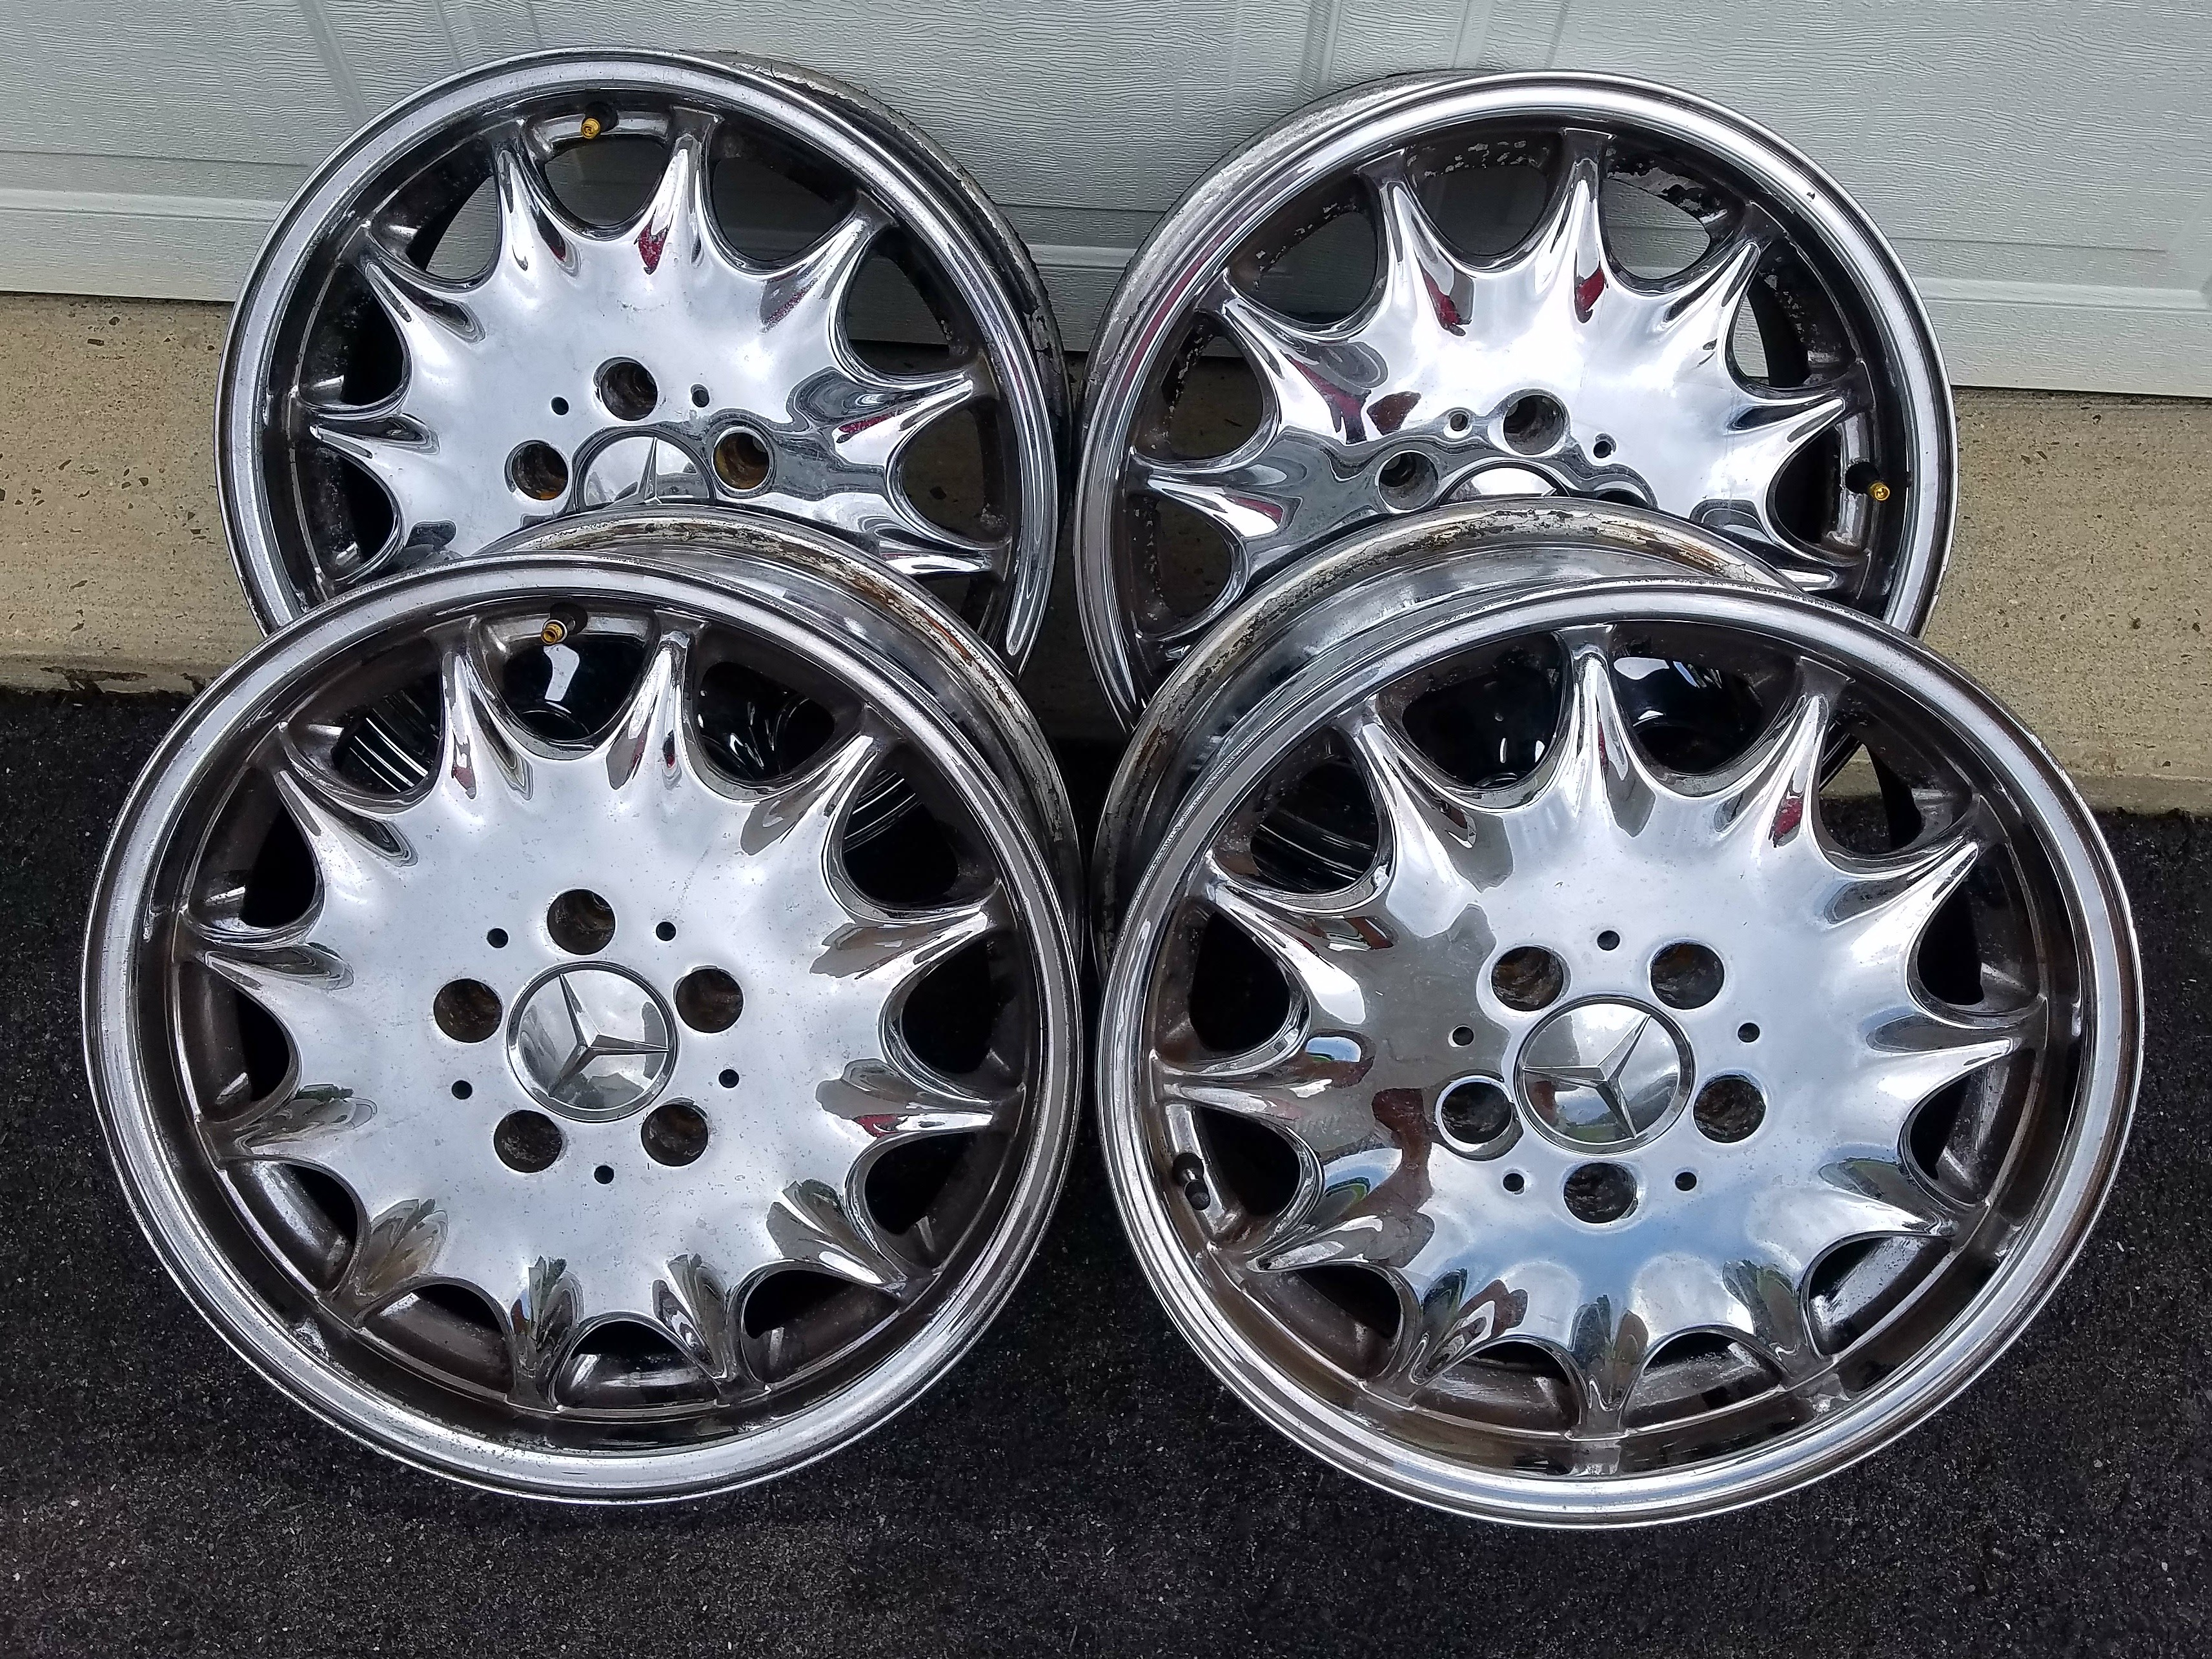 Mercedes Benz Chrome Wheels 16 For R129 Vehicles Mbca